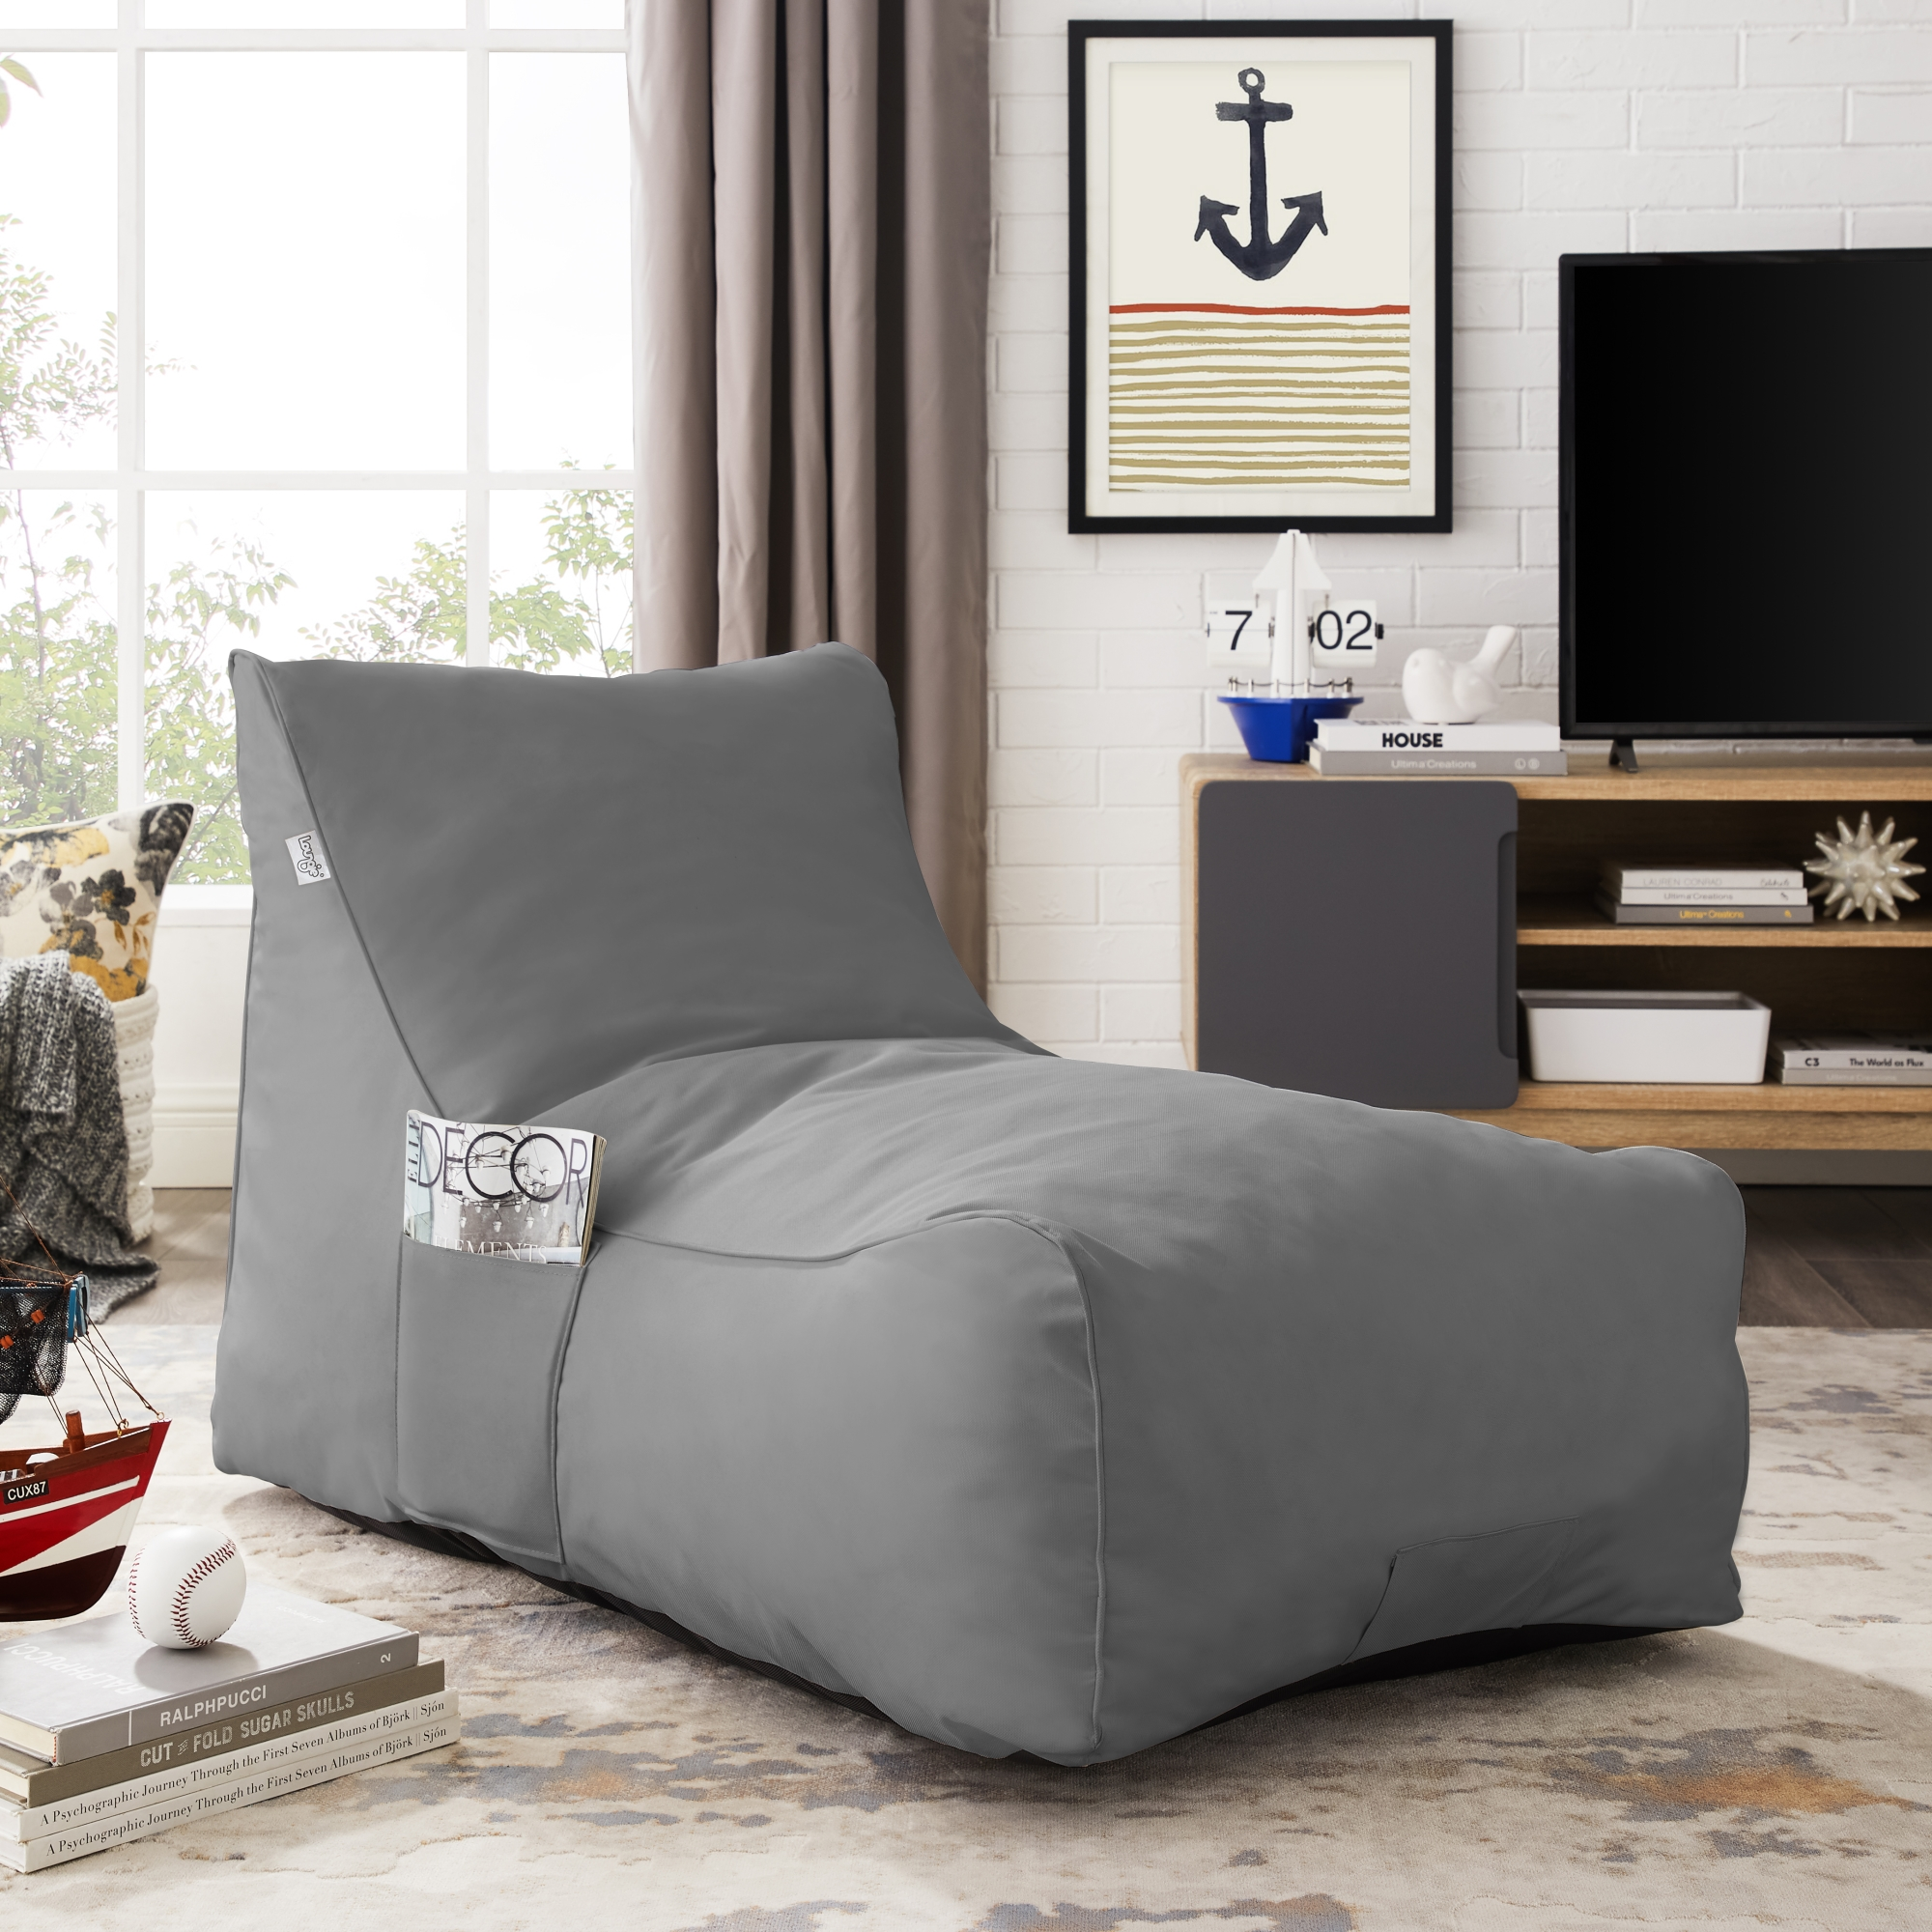 Resty Grey Memory Foam Sofa - Nylon   Indoor/ Outdoor   Self Expanding   Water Resistant   Sleeper Couch